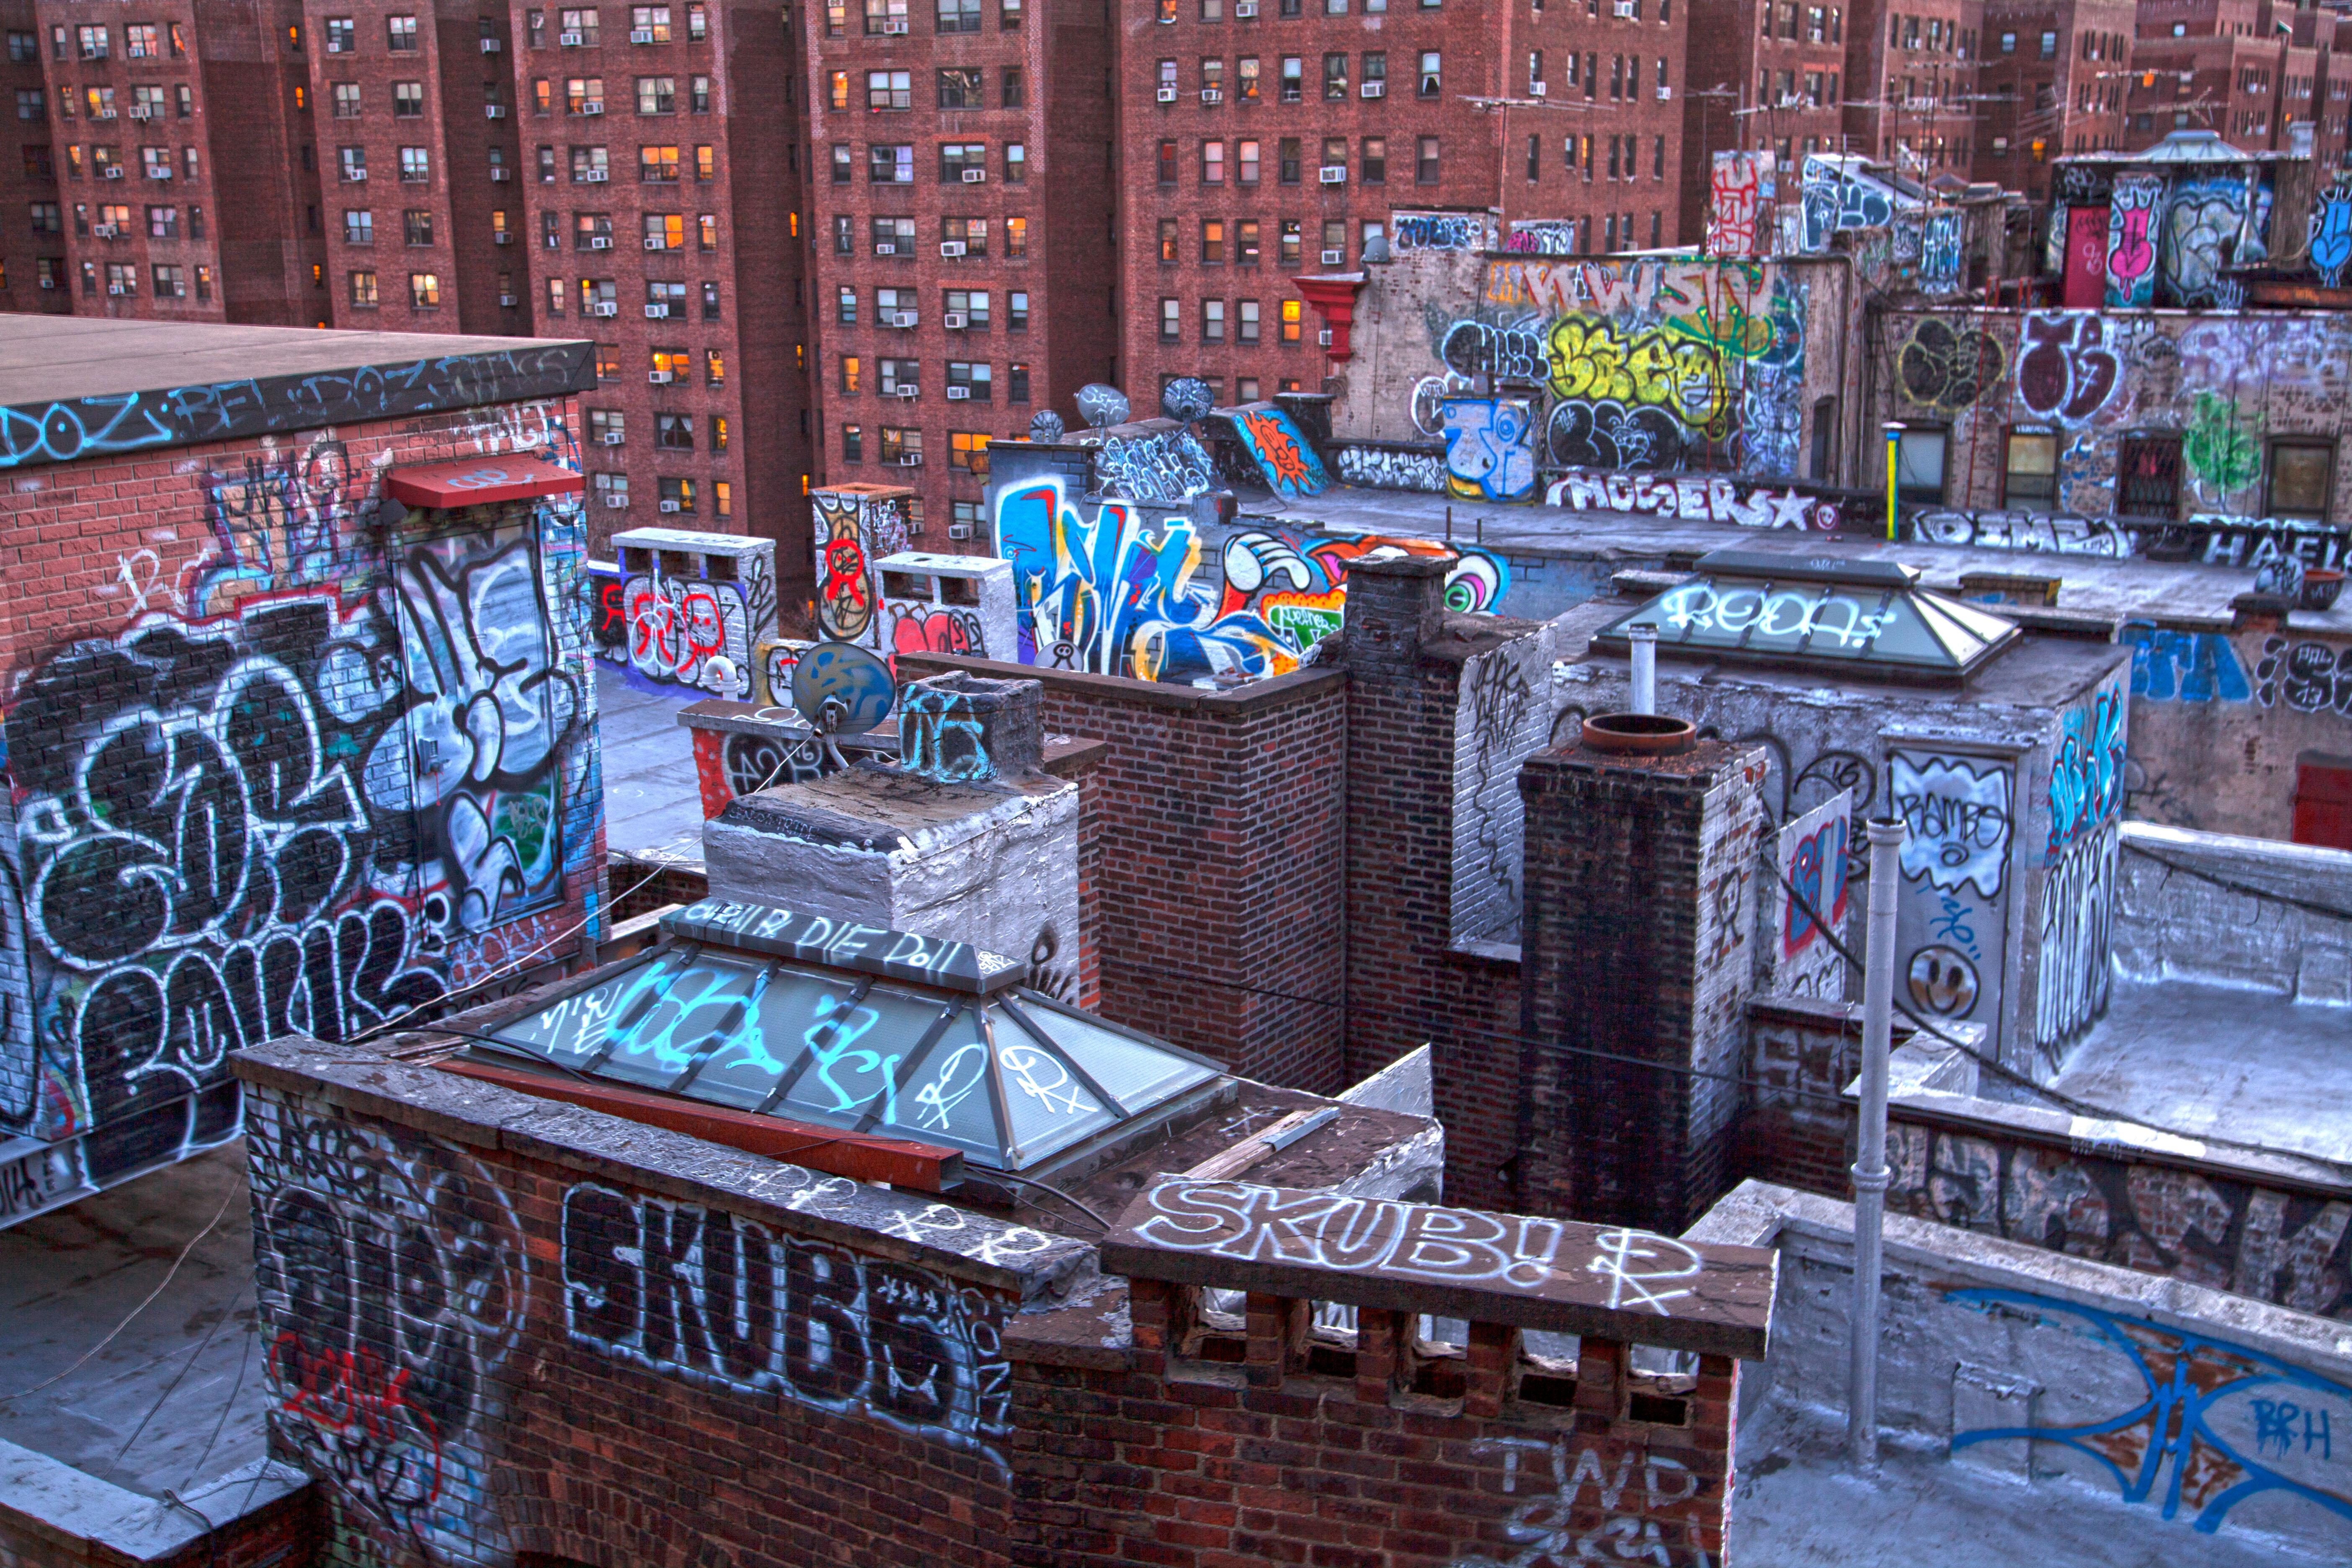 Lights City Urban Rooftops Graffiti Manhattan Neighborhood Brick Chinatown Gritty ART Color Buildings Newyork Windows Paint